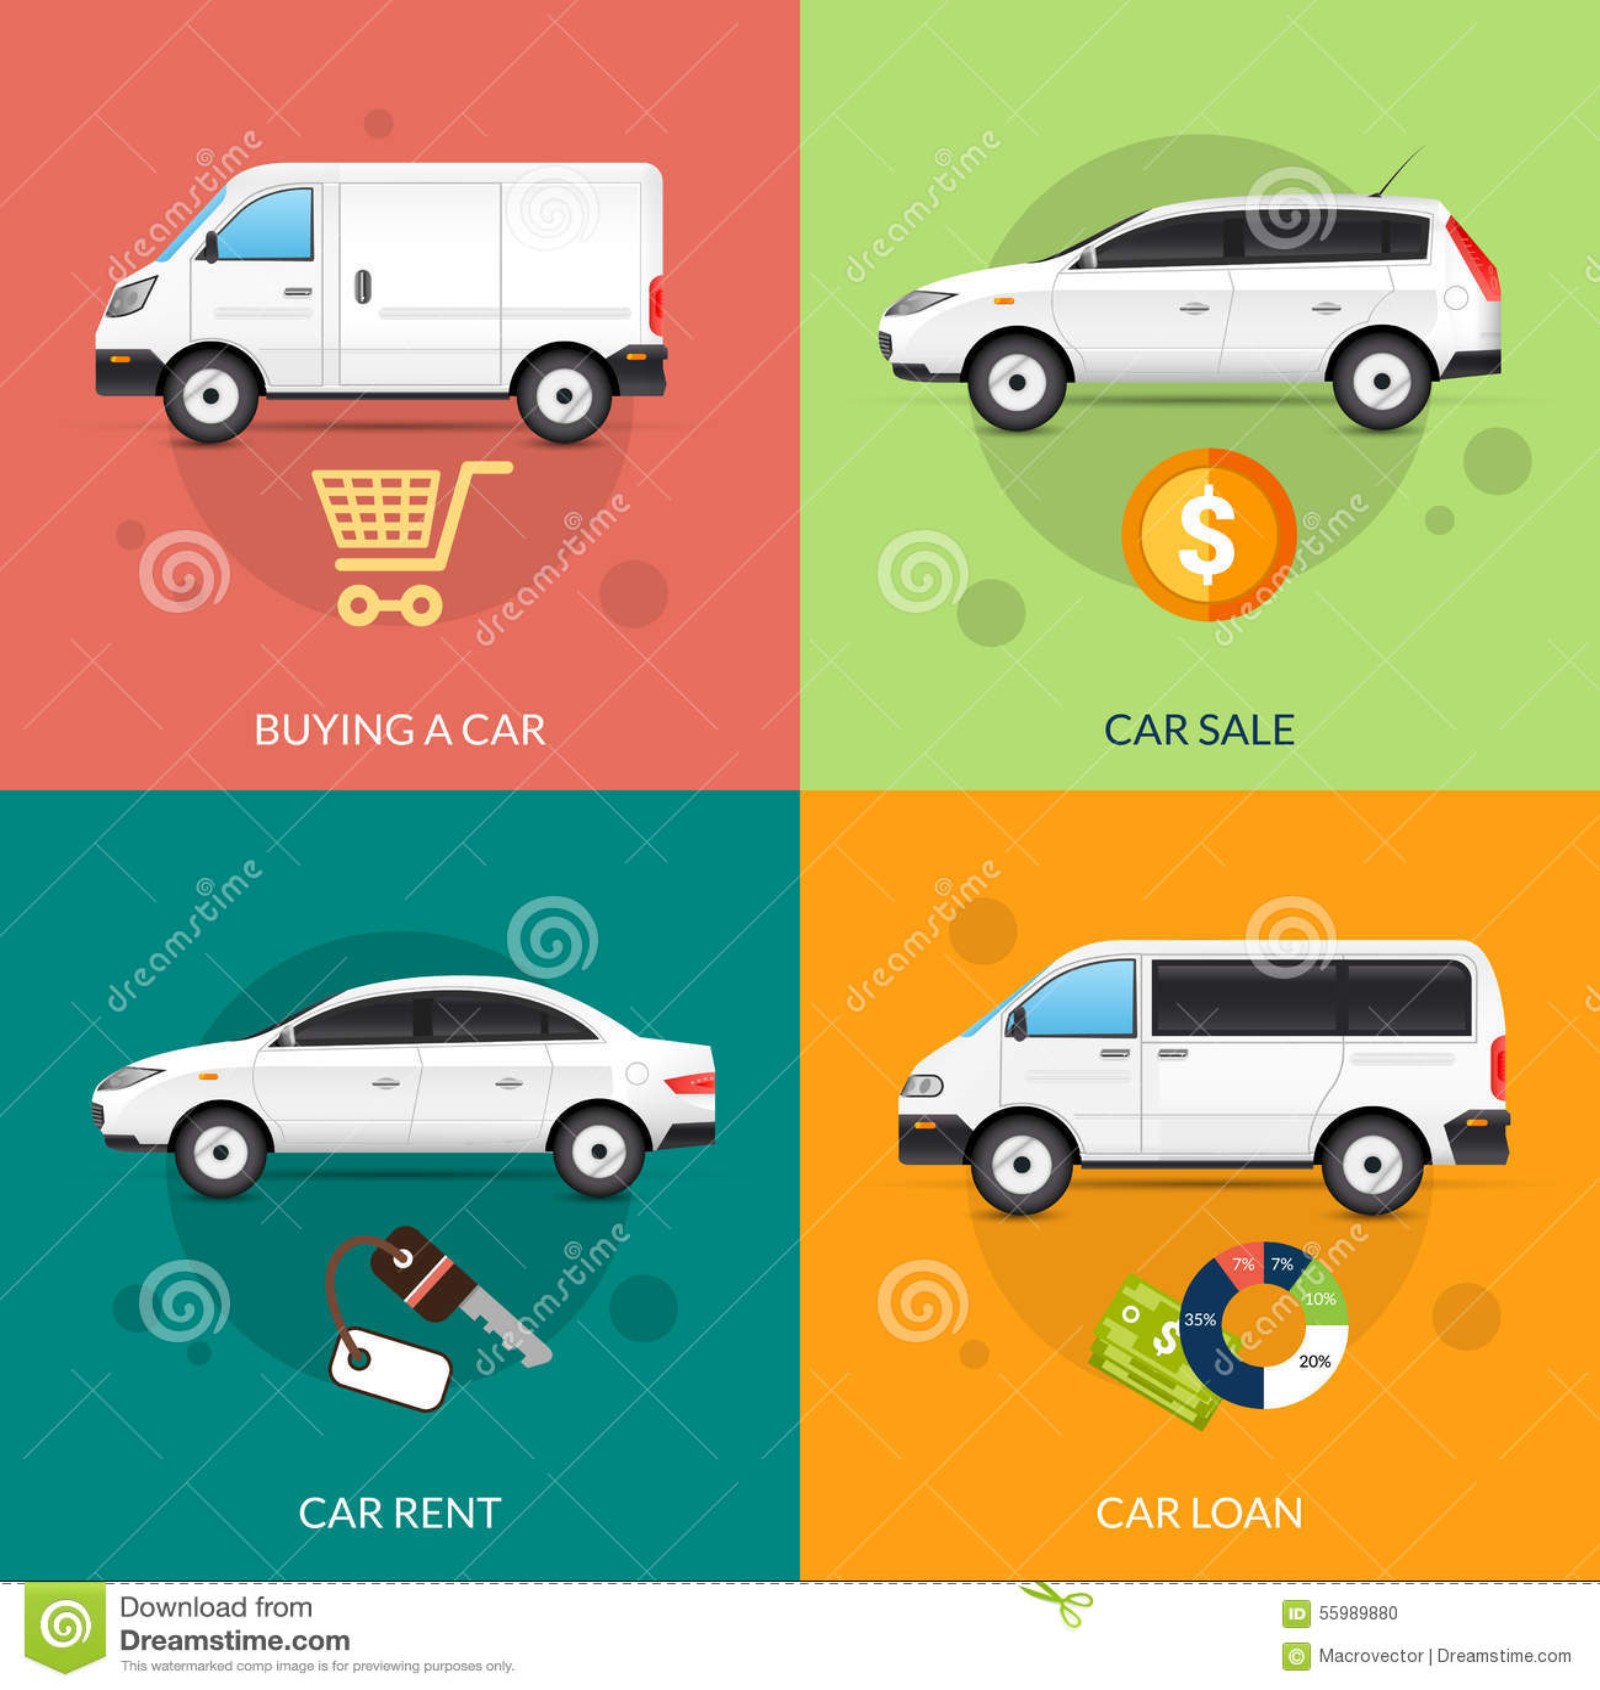 car for rent and sale stock vector image 55989880. Black Bedroom Furniture Sets. Home Design Ideas